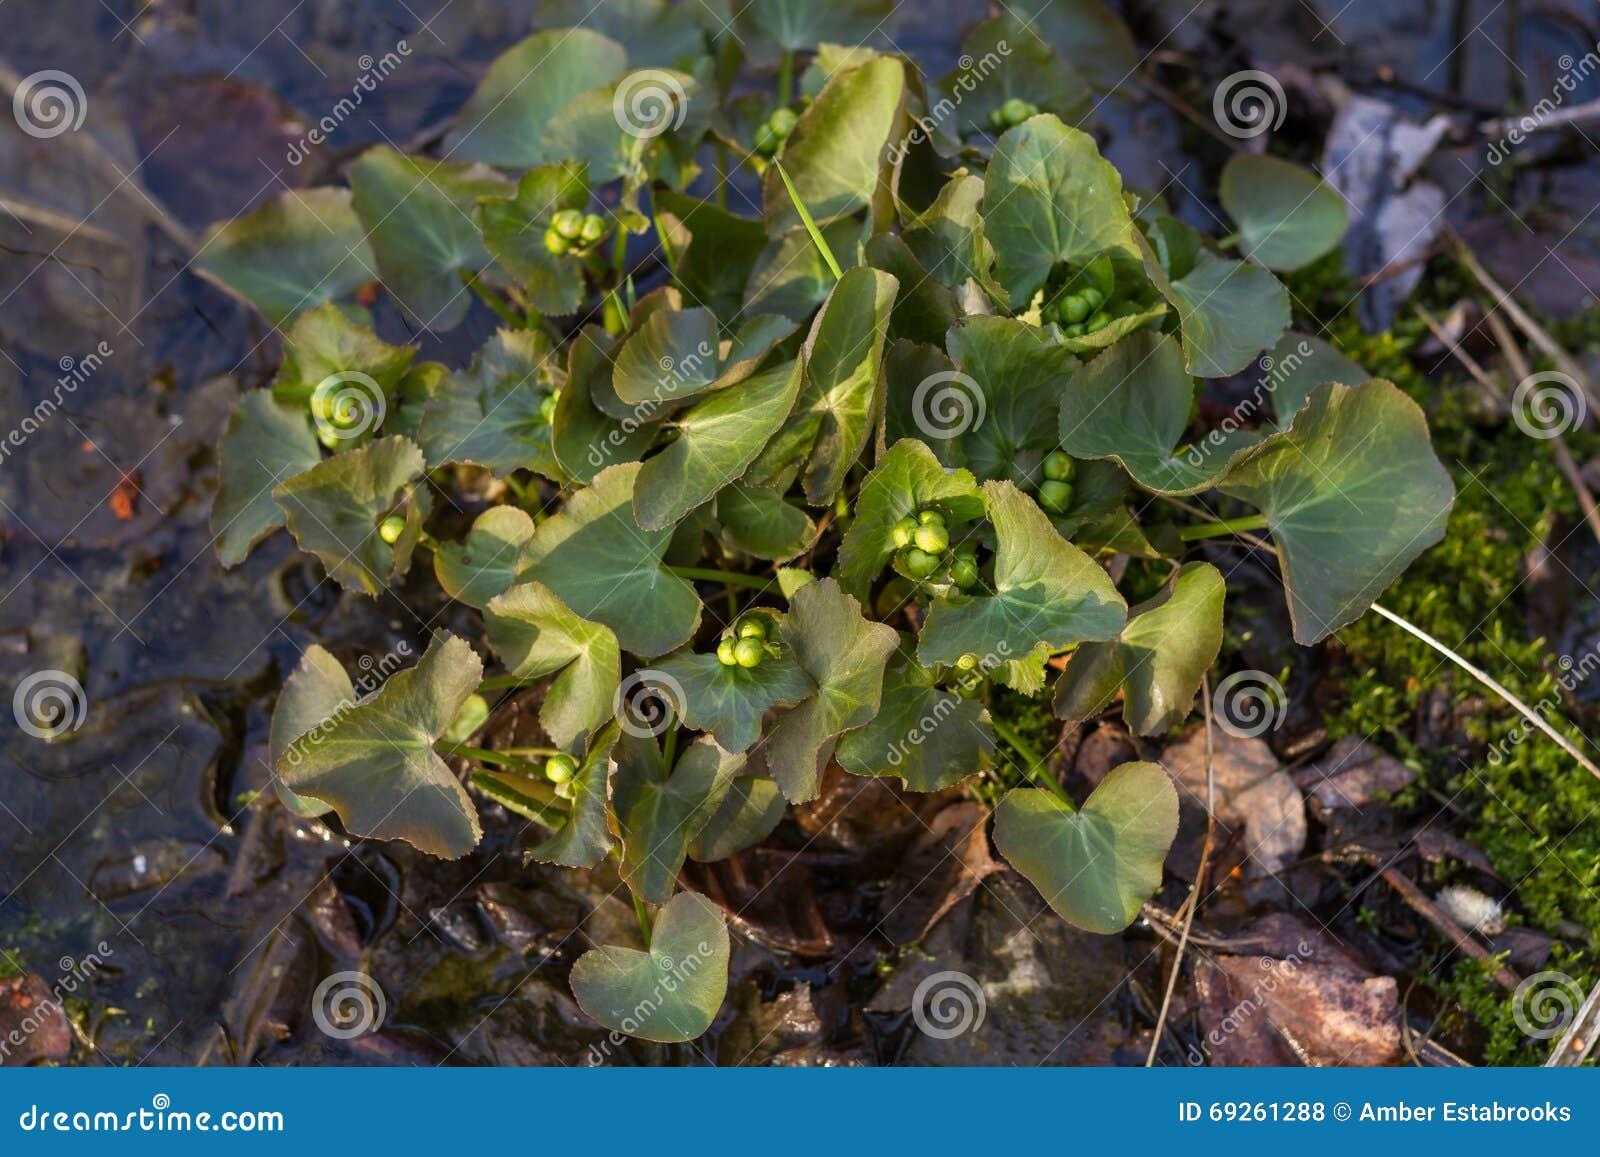 Marsh Marigold Buds